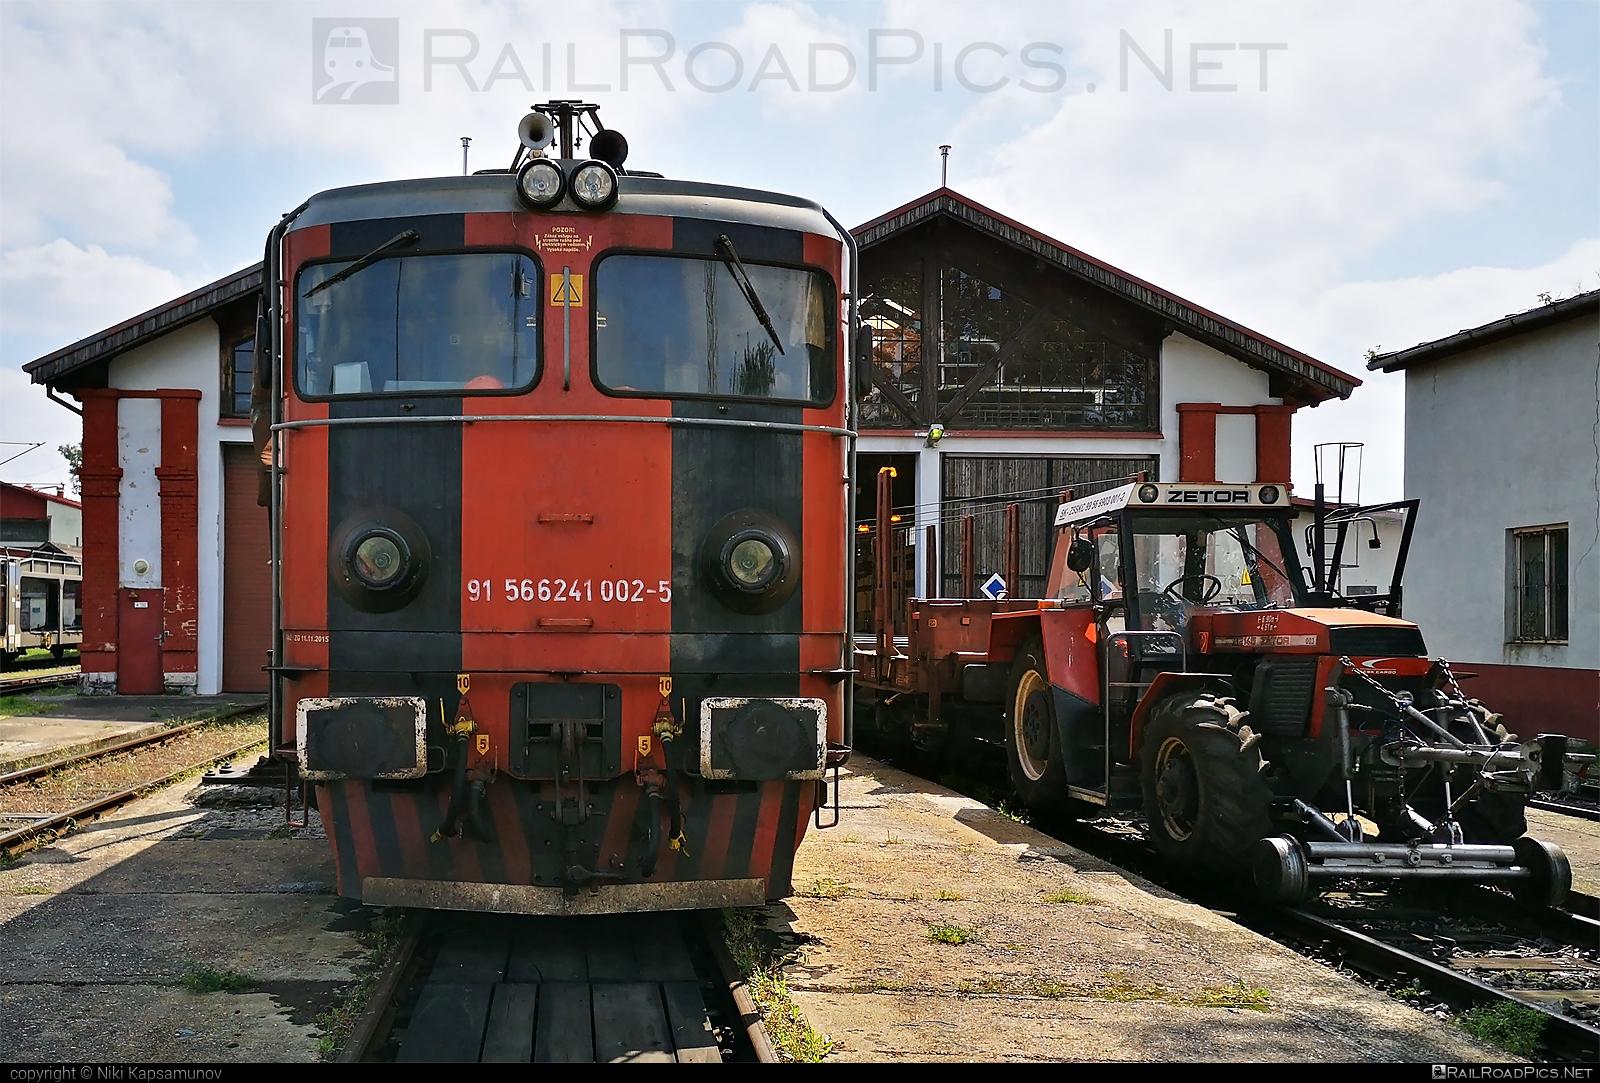 Končar JŽ class 441 - 241 002-5 operated by CENTRAL RAILWAYS s.r.o. #crw #electroputere #jz441 #koncar #koncar441